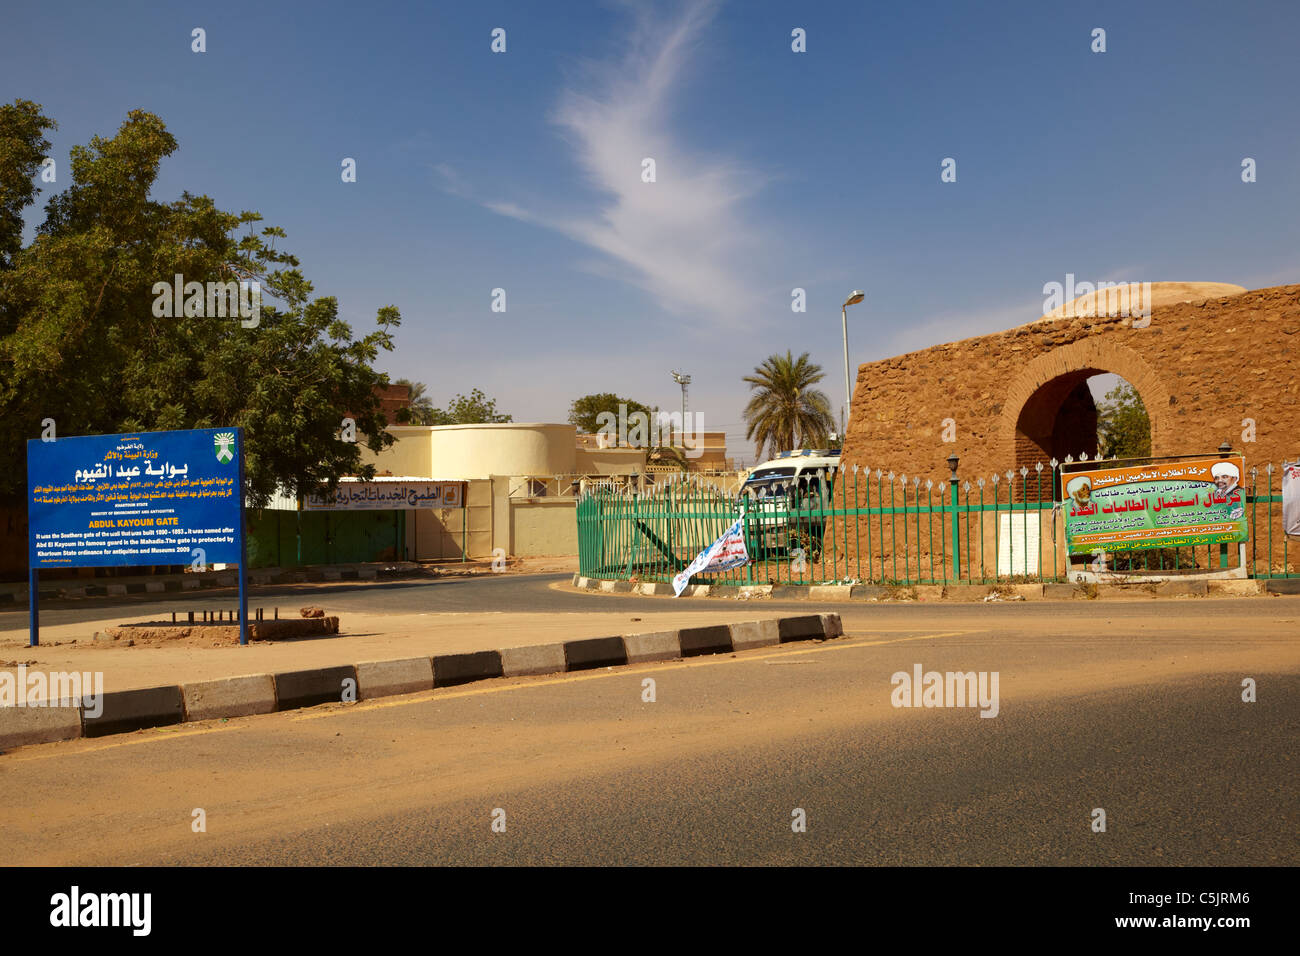 Abdul Kayoum Gate, Omdurman, Northern Sudan, Africa - Stock Image